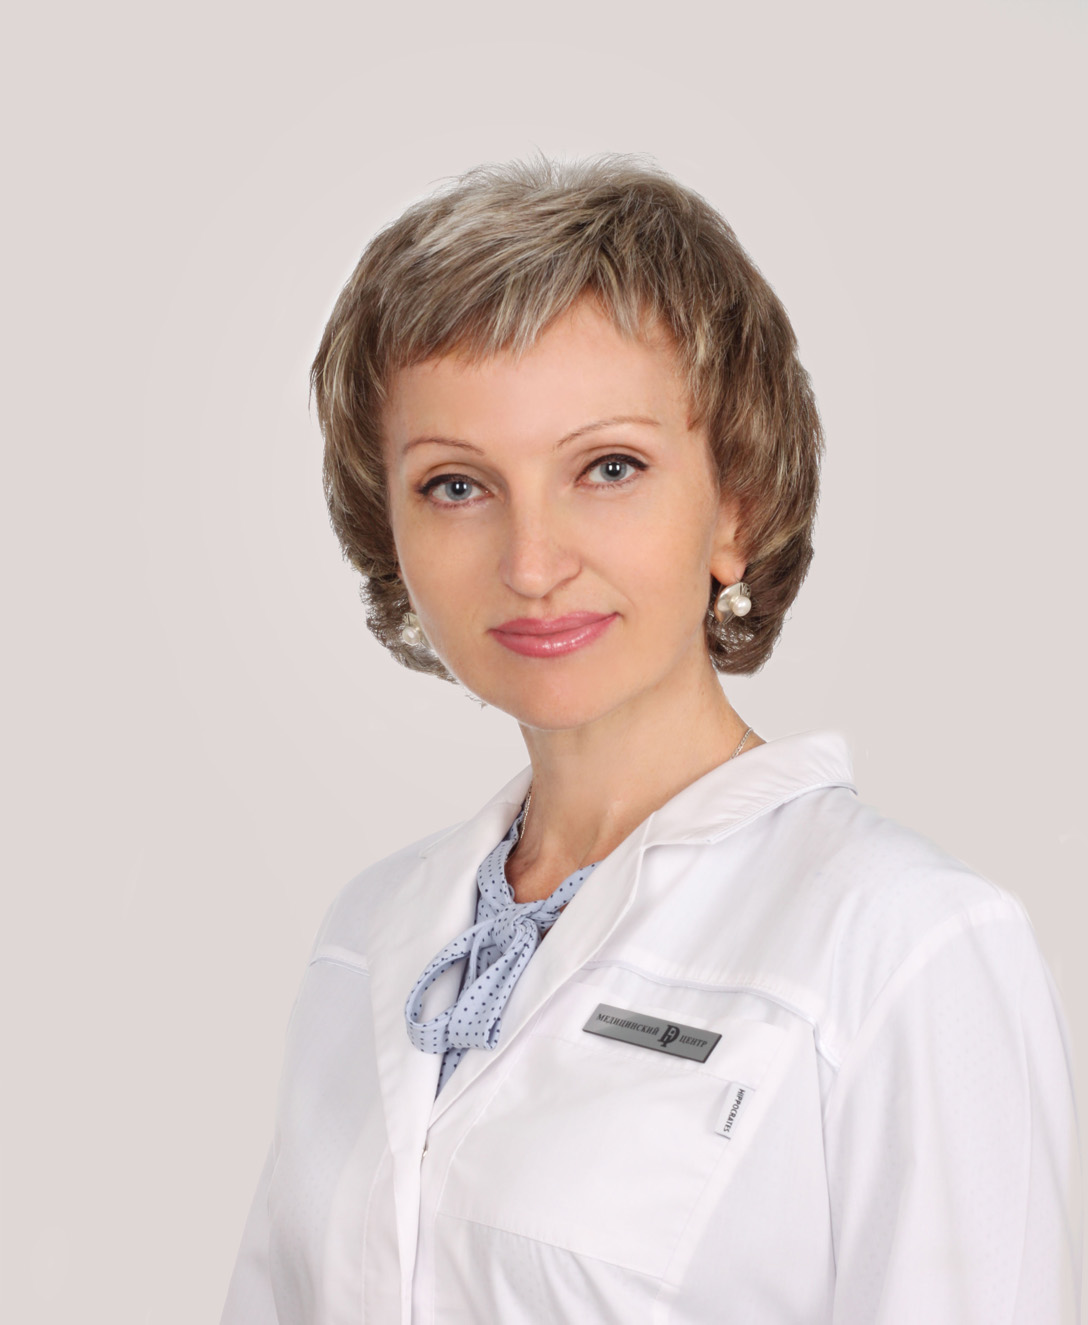 Мамаева Людмила Александровна